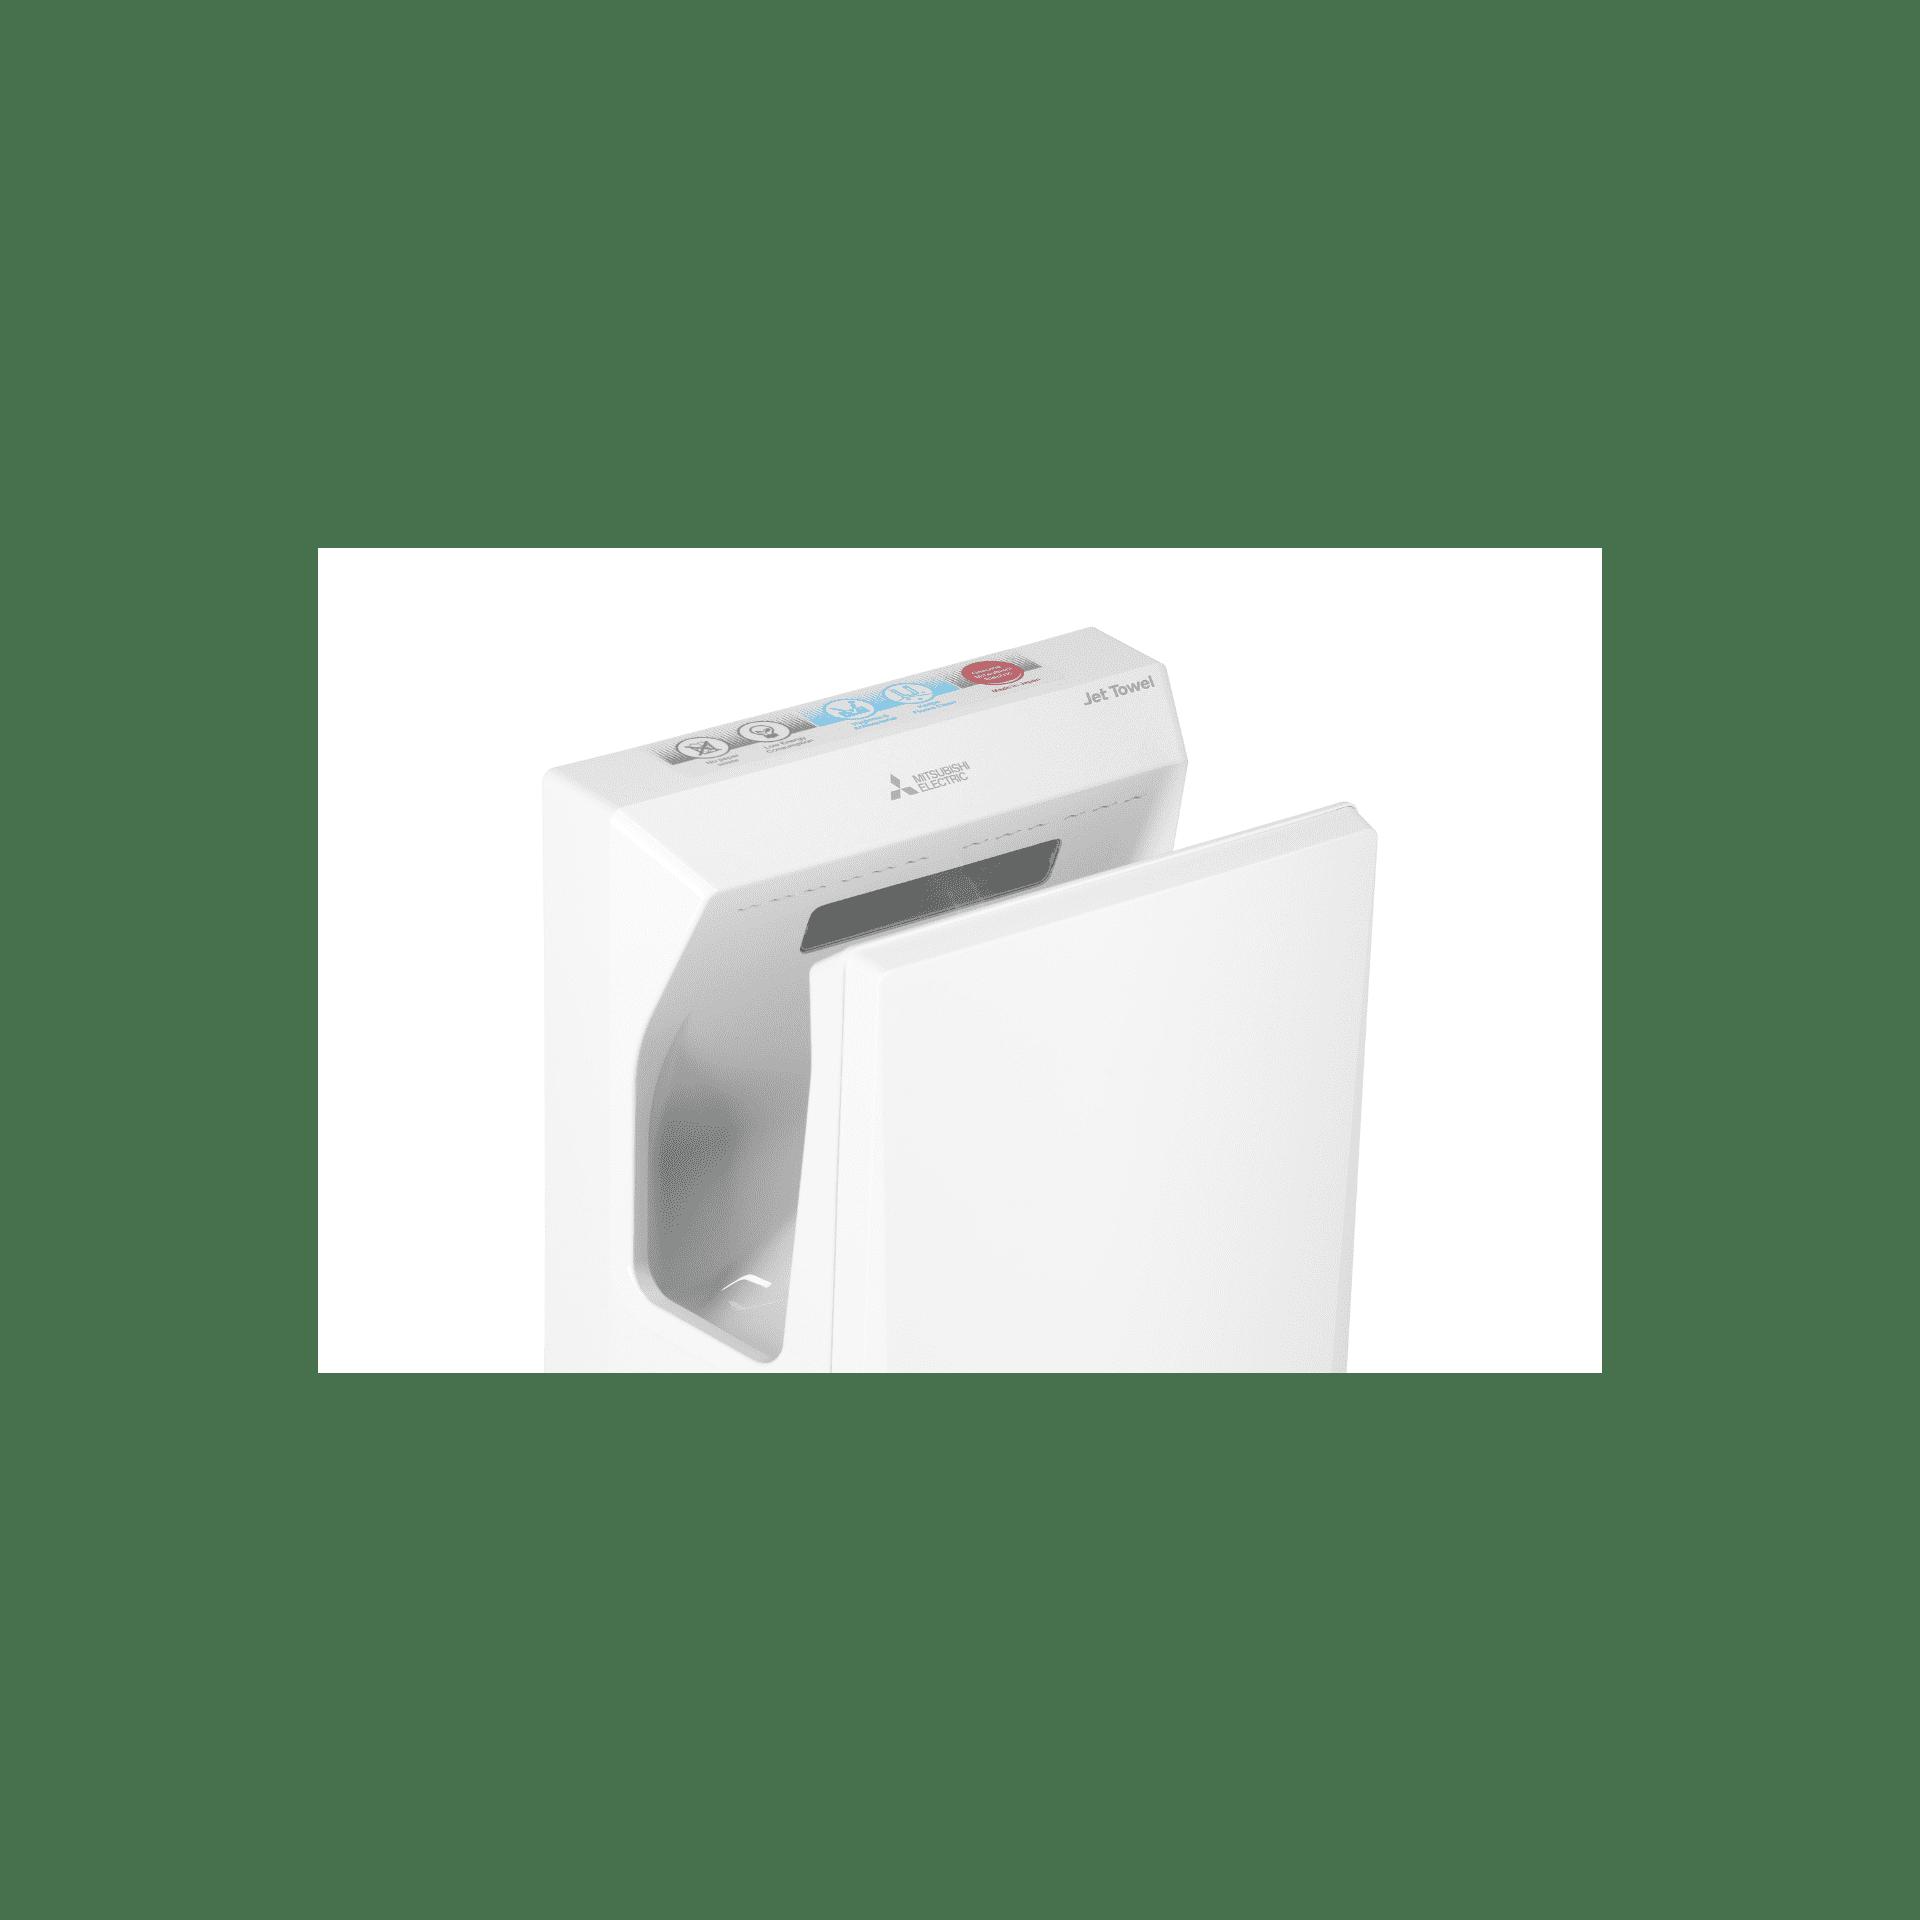 mitsubishi dryer document bu jettowel hand indd products handdryer for newslim asia pdf